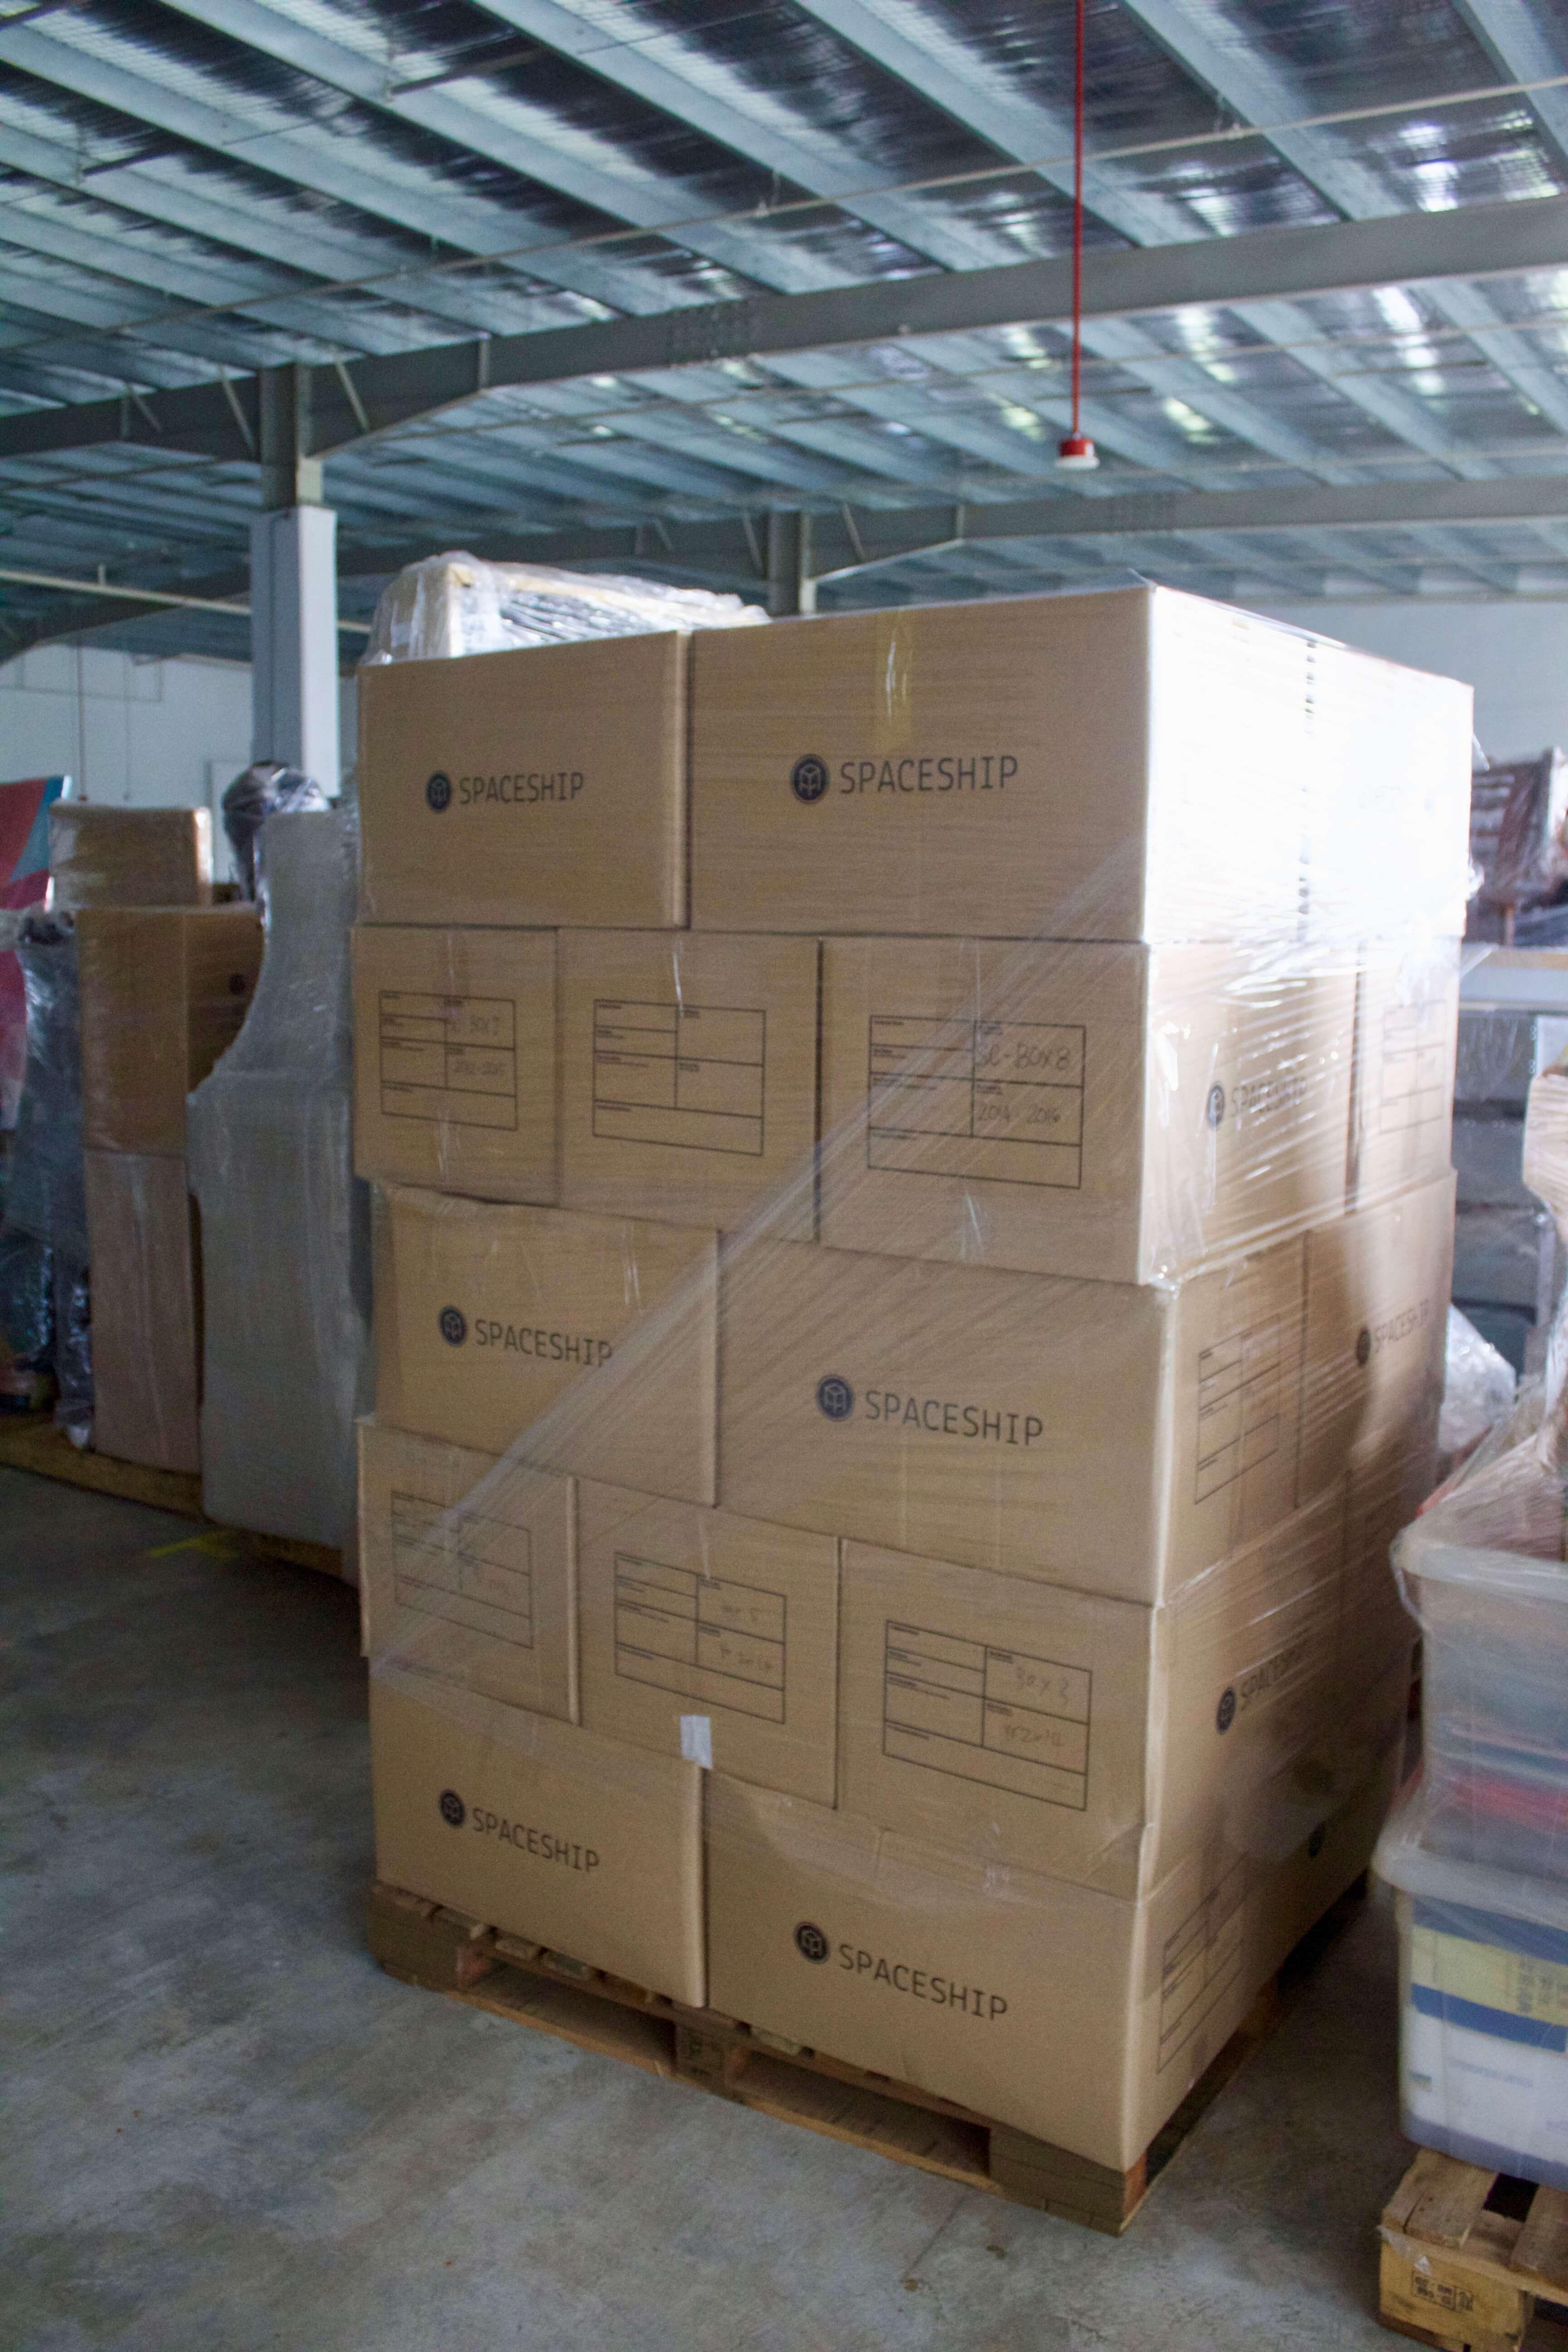 Spaceship box storage - 15 sq feet